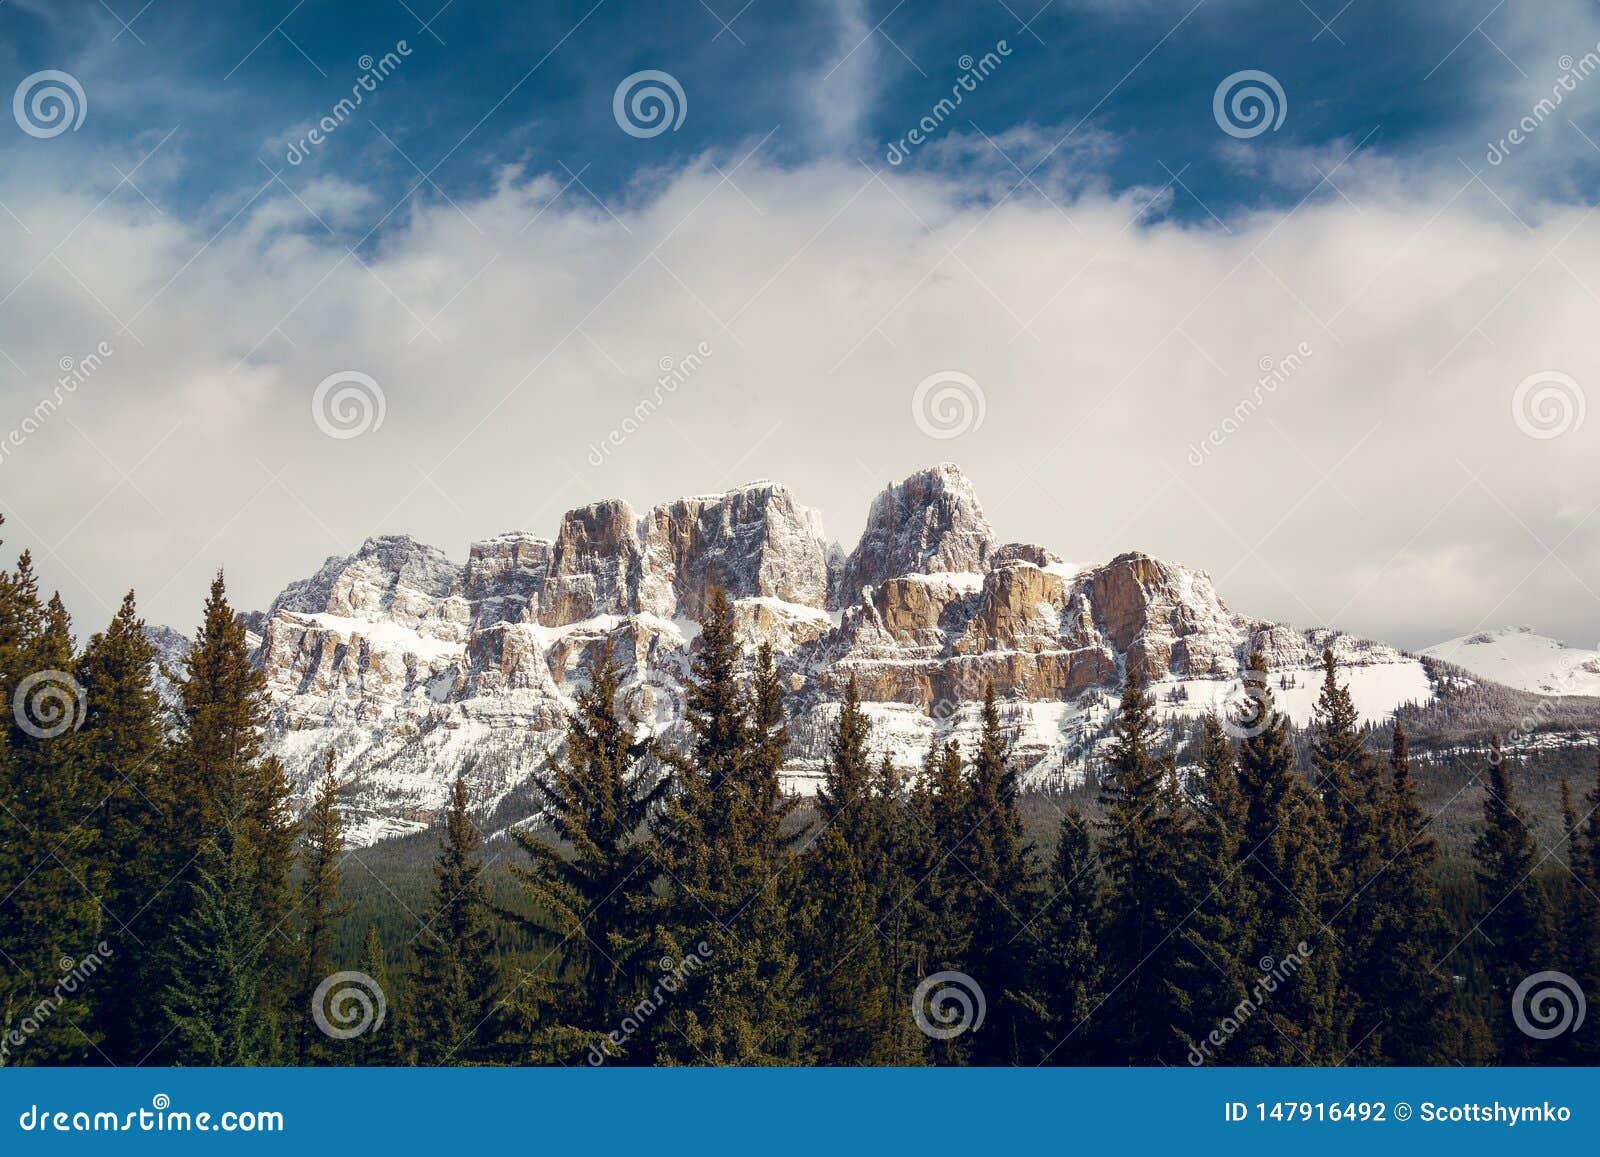 Schloss-Gebirgskreuzung in Mitte des Winters Banffs Alberta